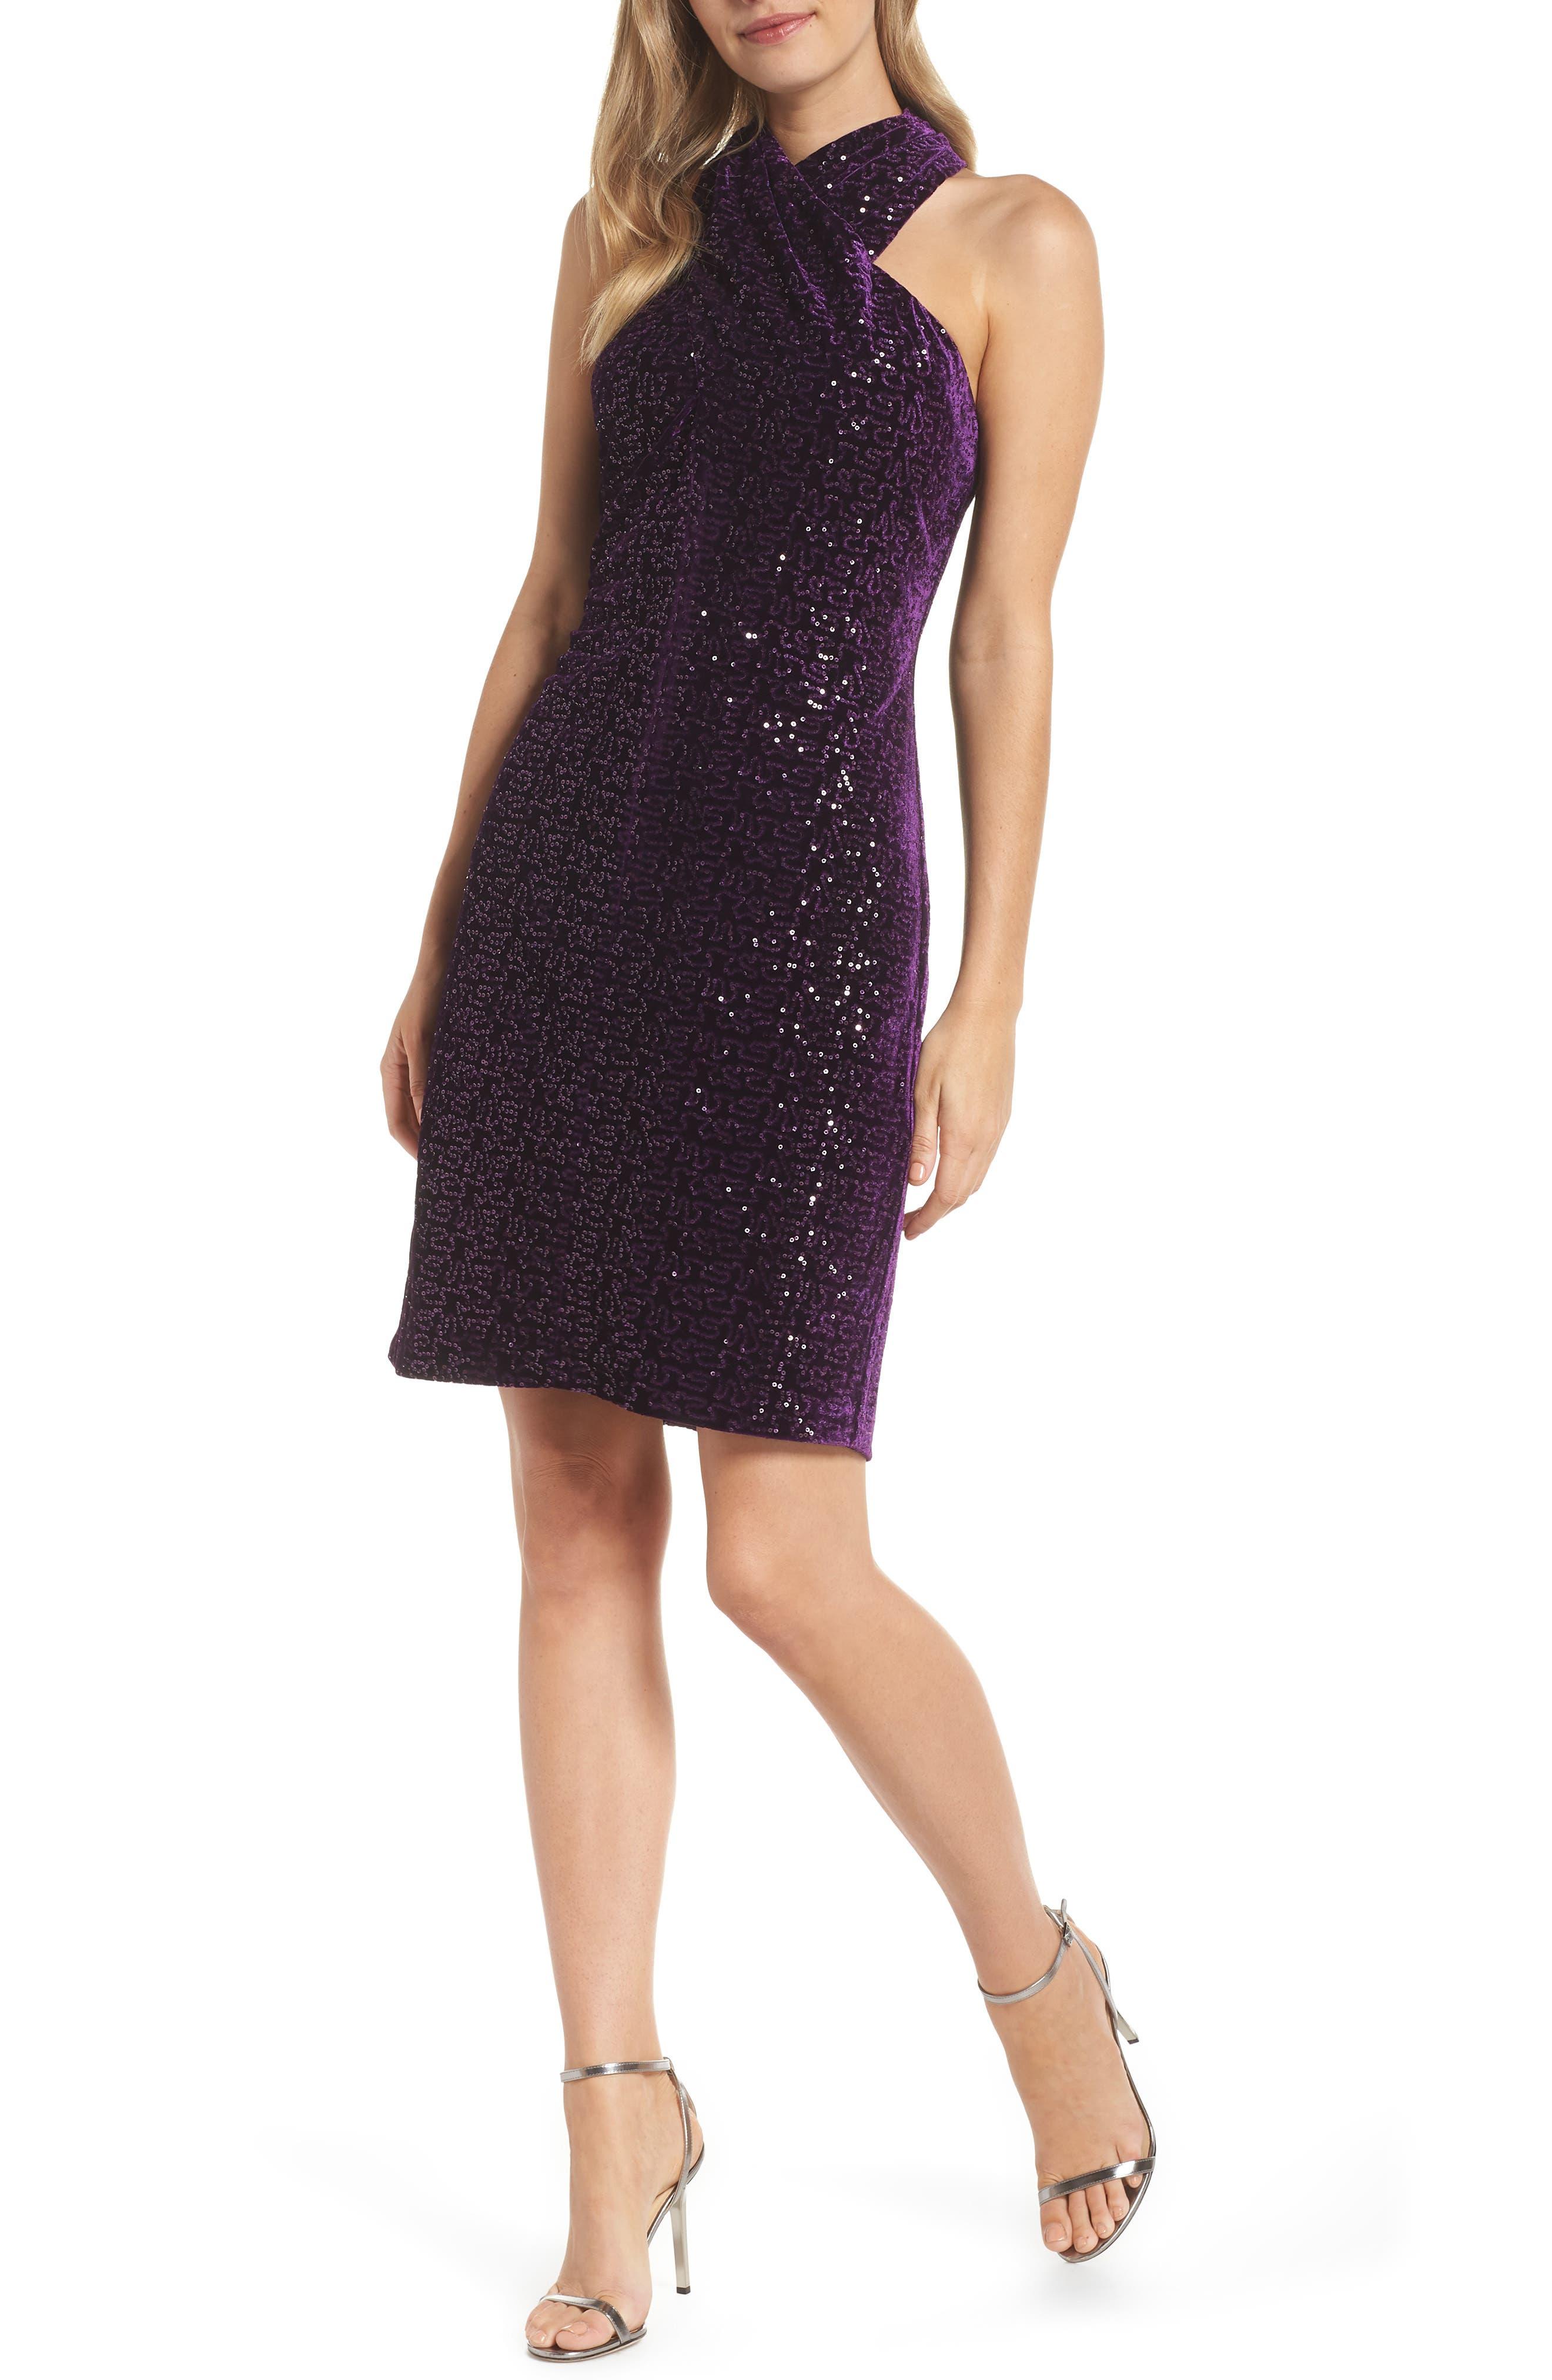 ELIZA J, Halter Sheath Dress, Main thumbnail 1, color, 506